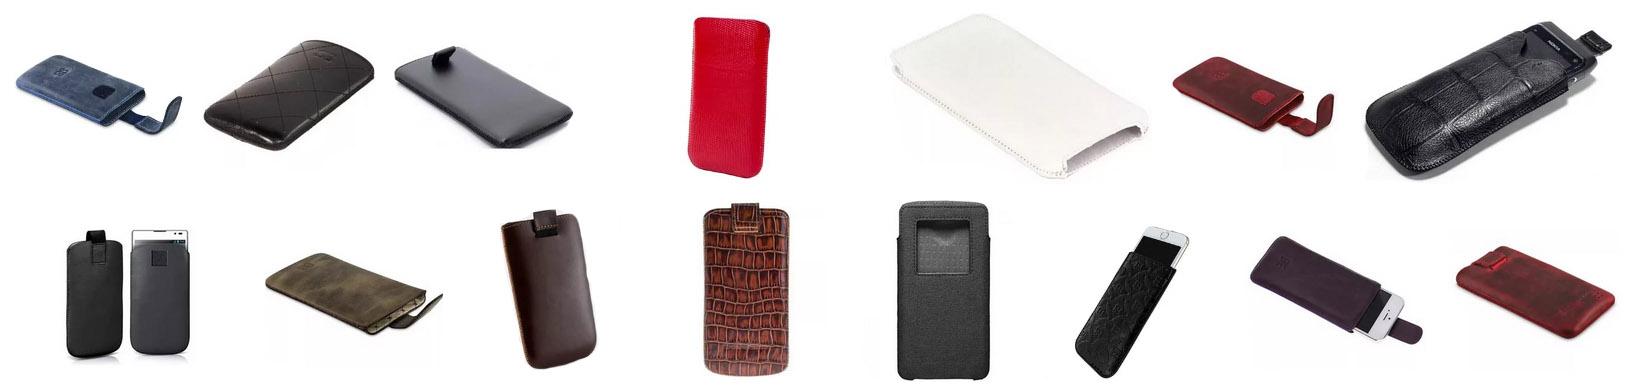 Чехлы карманы фото 1